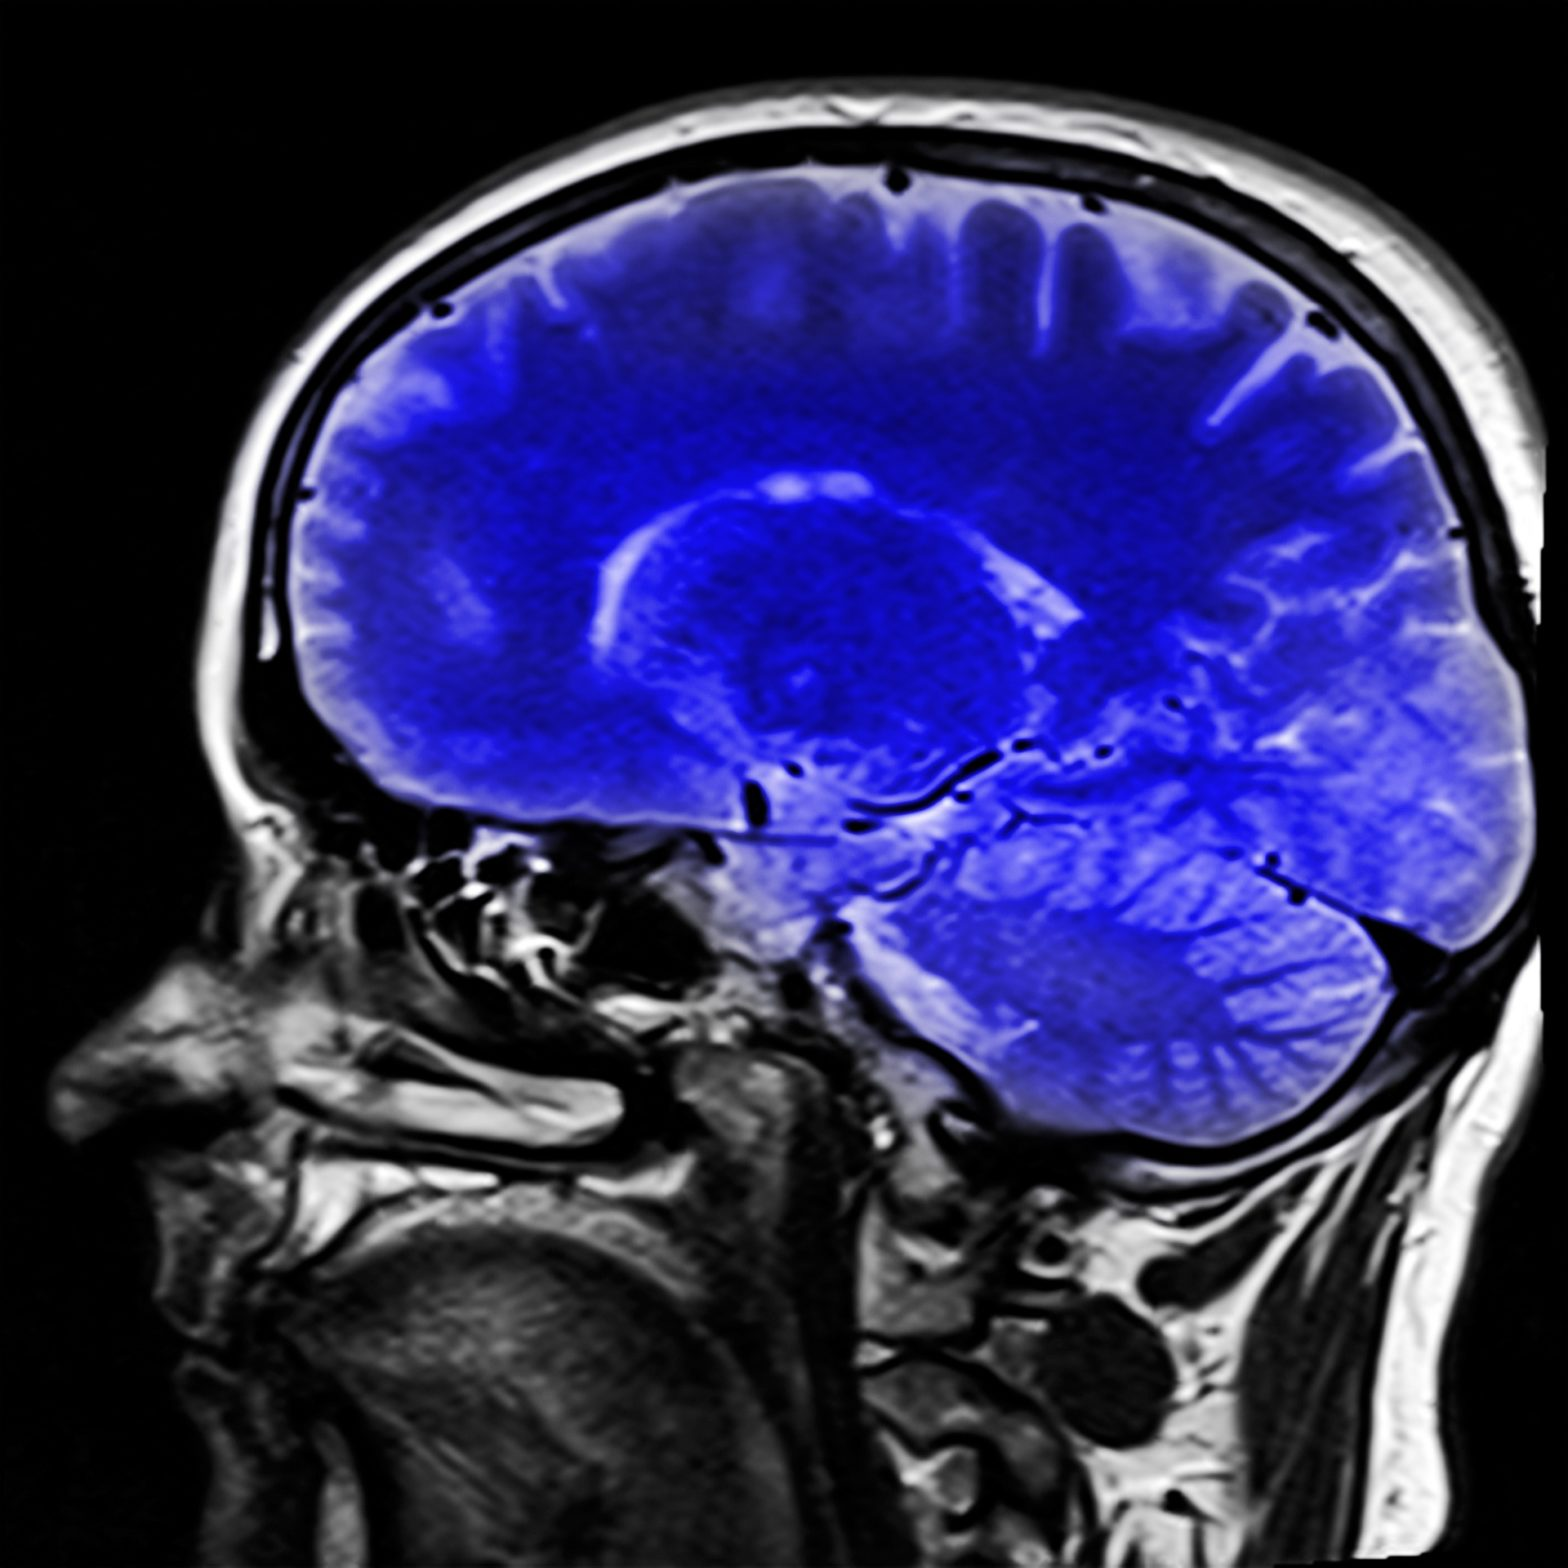 The Addicted Brain